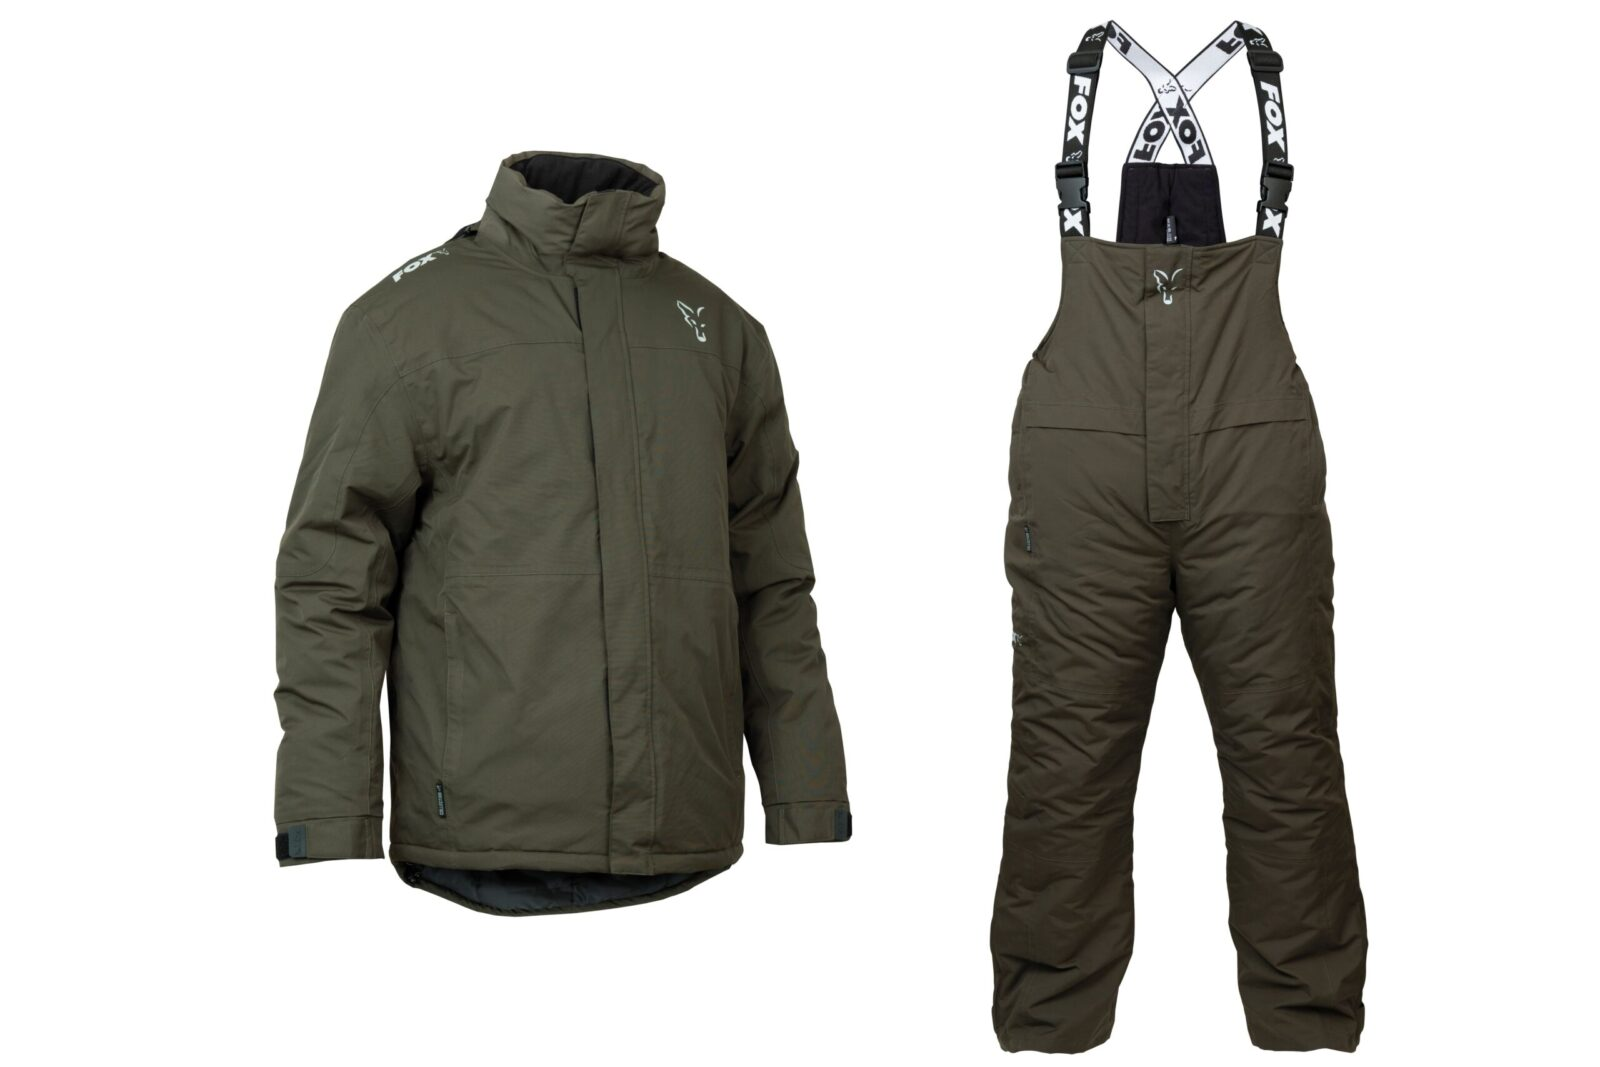 FOX Zimní komplet Carp Winter suit